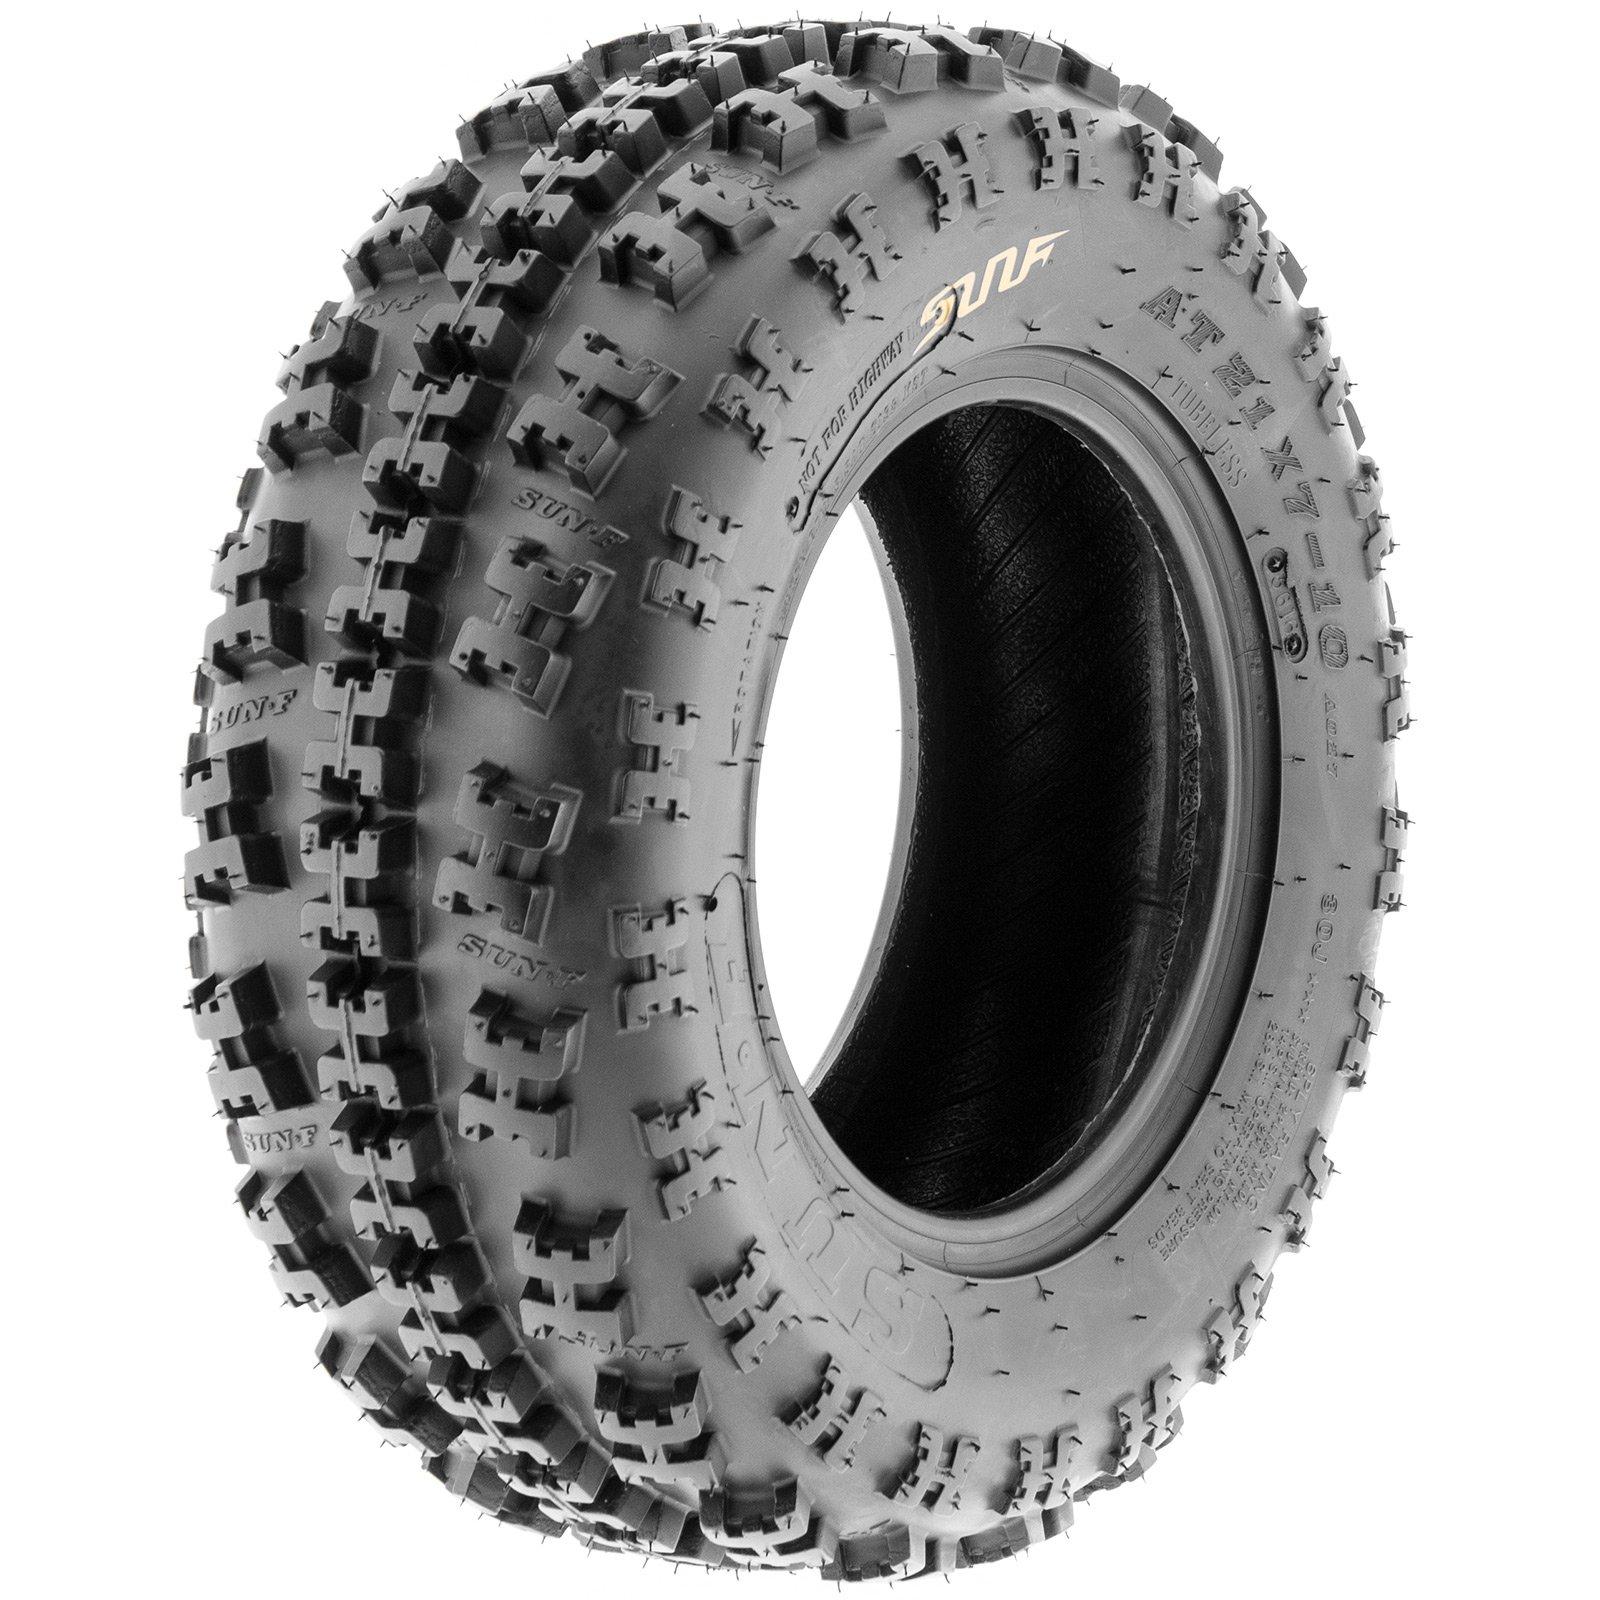 SunF A027 XC ATV UTV Knobby Sport Tire 19x7-8, 6 PR, Tubeless